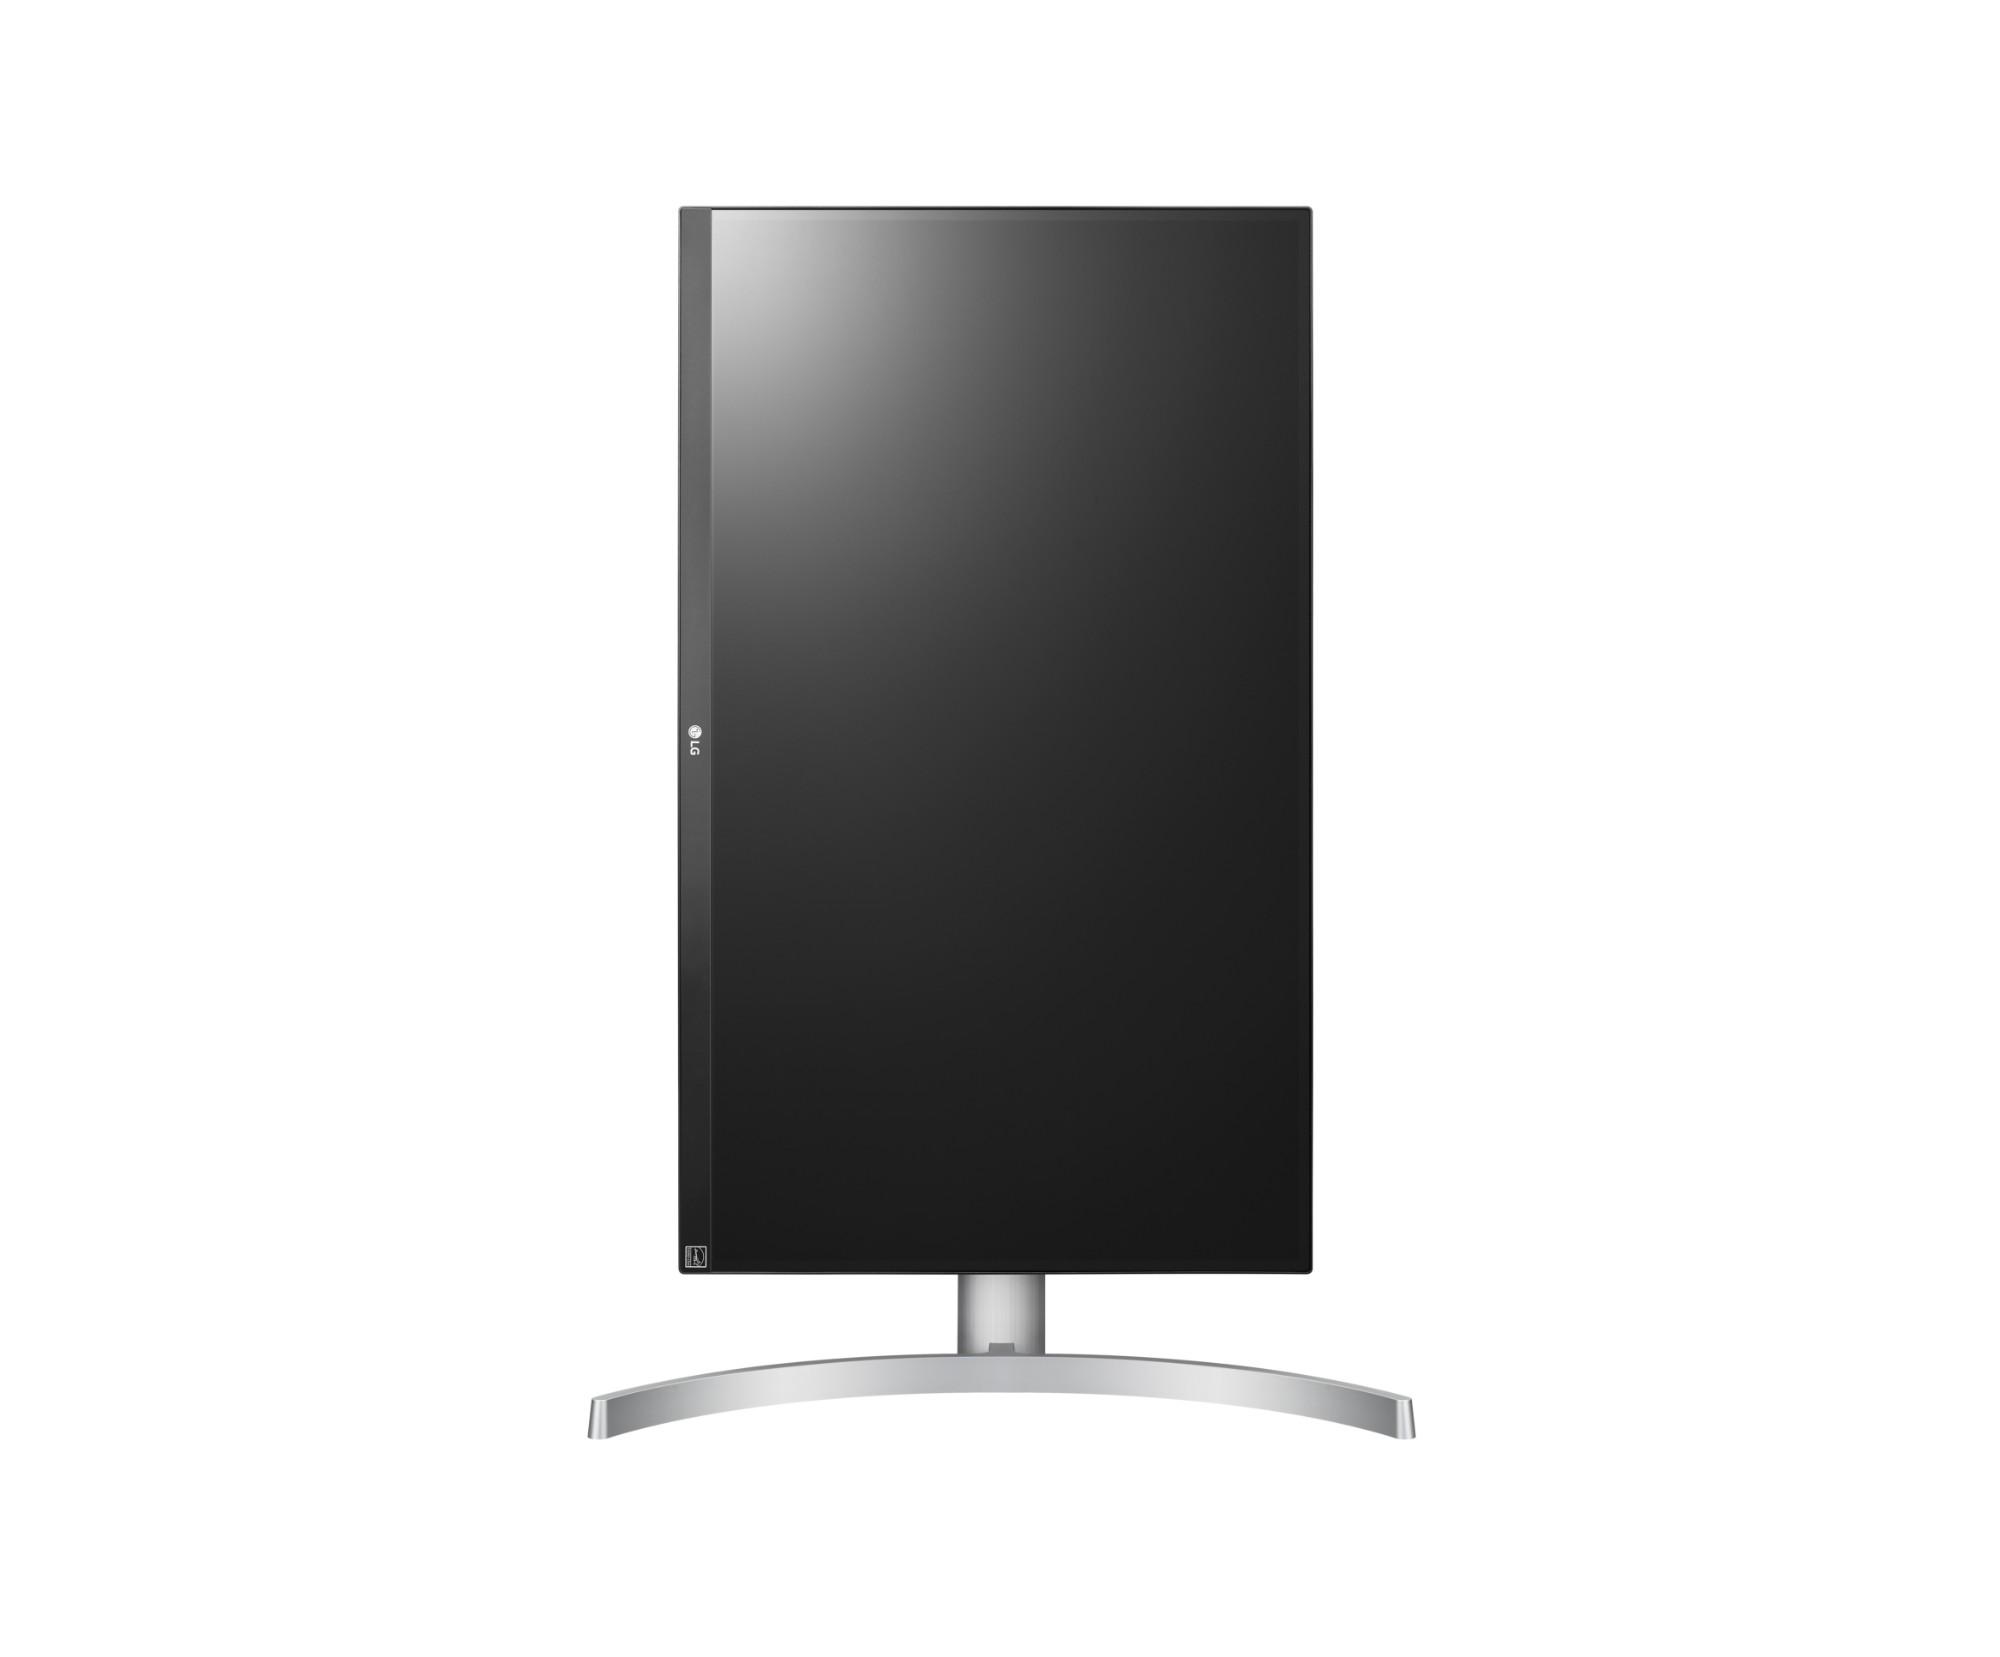 Lg 27uk650 W 27 4k Ultra Hd Led Flat Black Silver White Computer Monitor Full Gaming 24 Inch 24gm79g B Enlarge